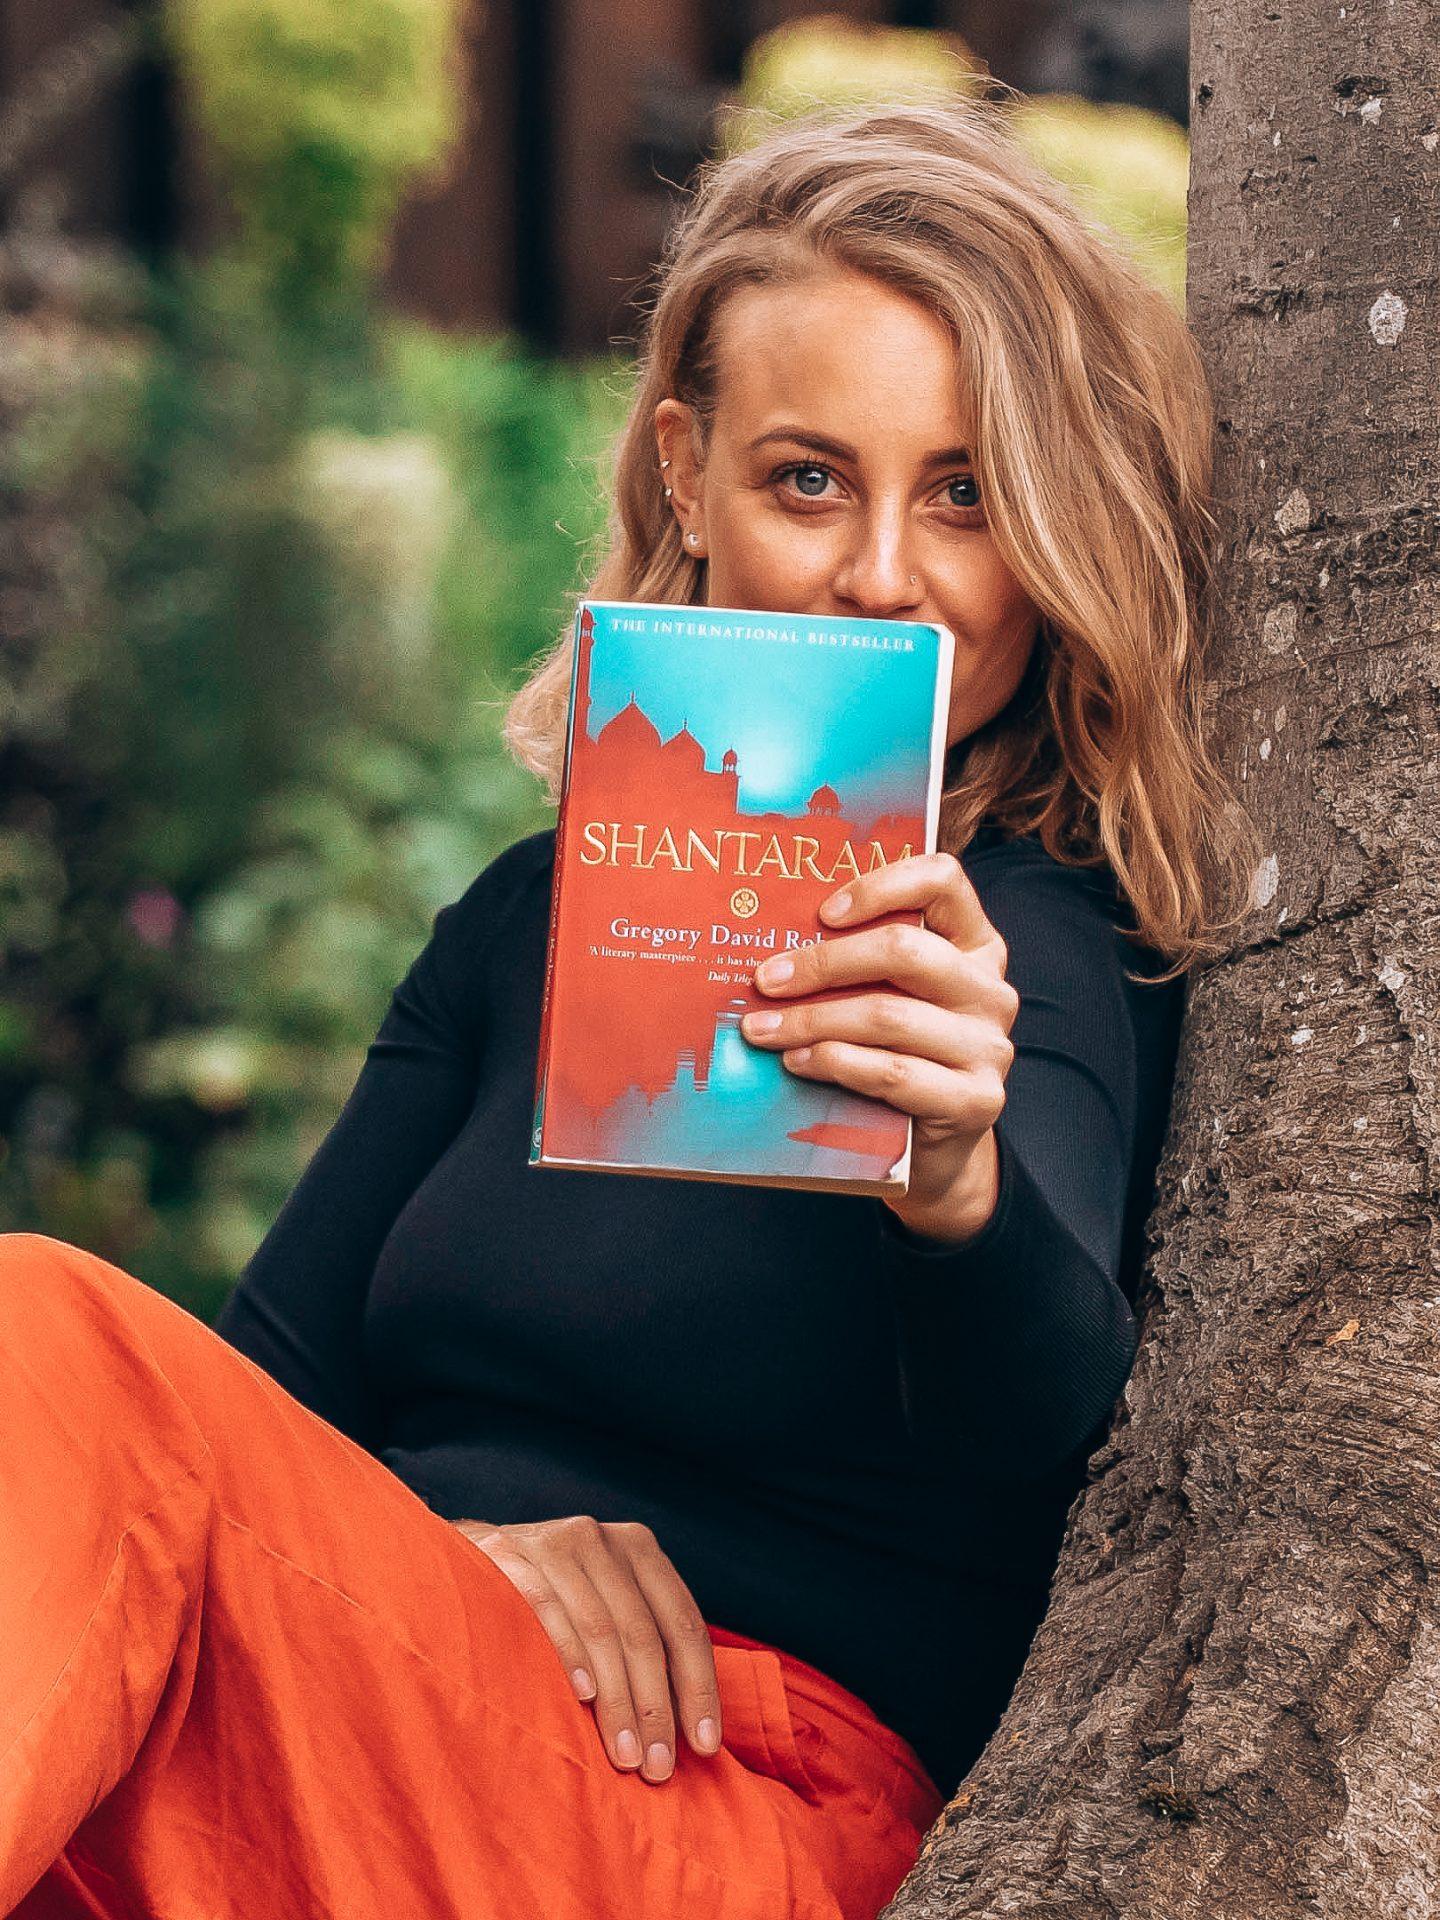 Shantaram Review - Sarah under the tree holding the Shantaram book in front of her